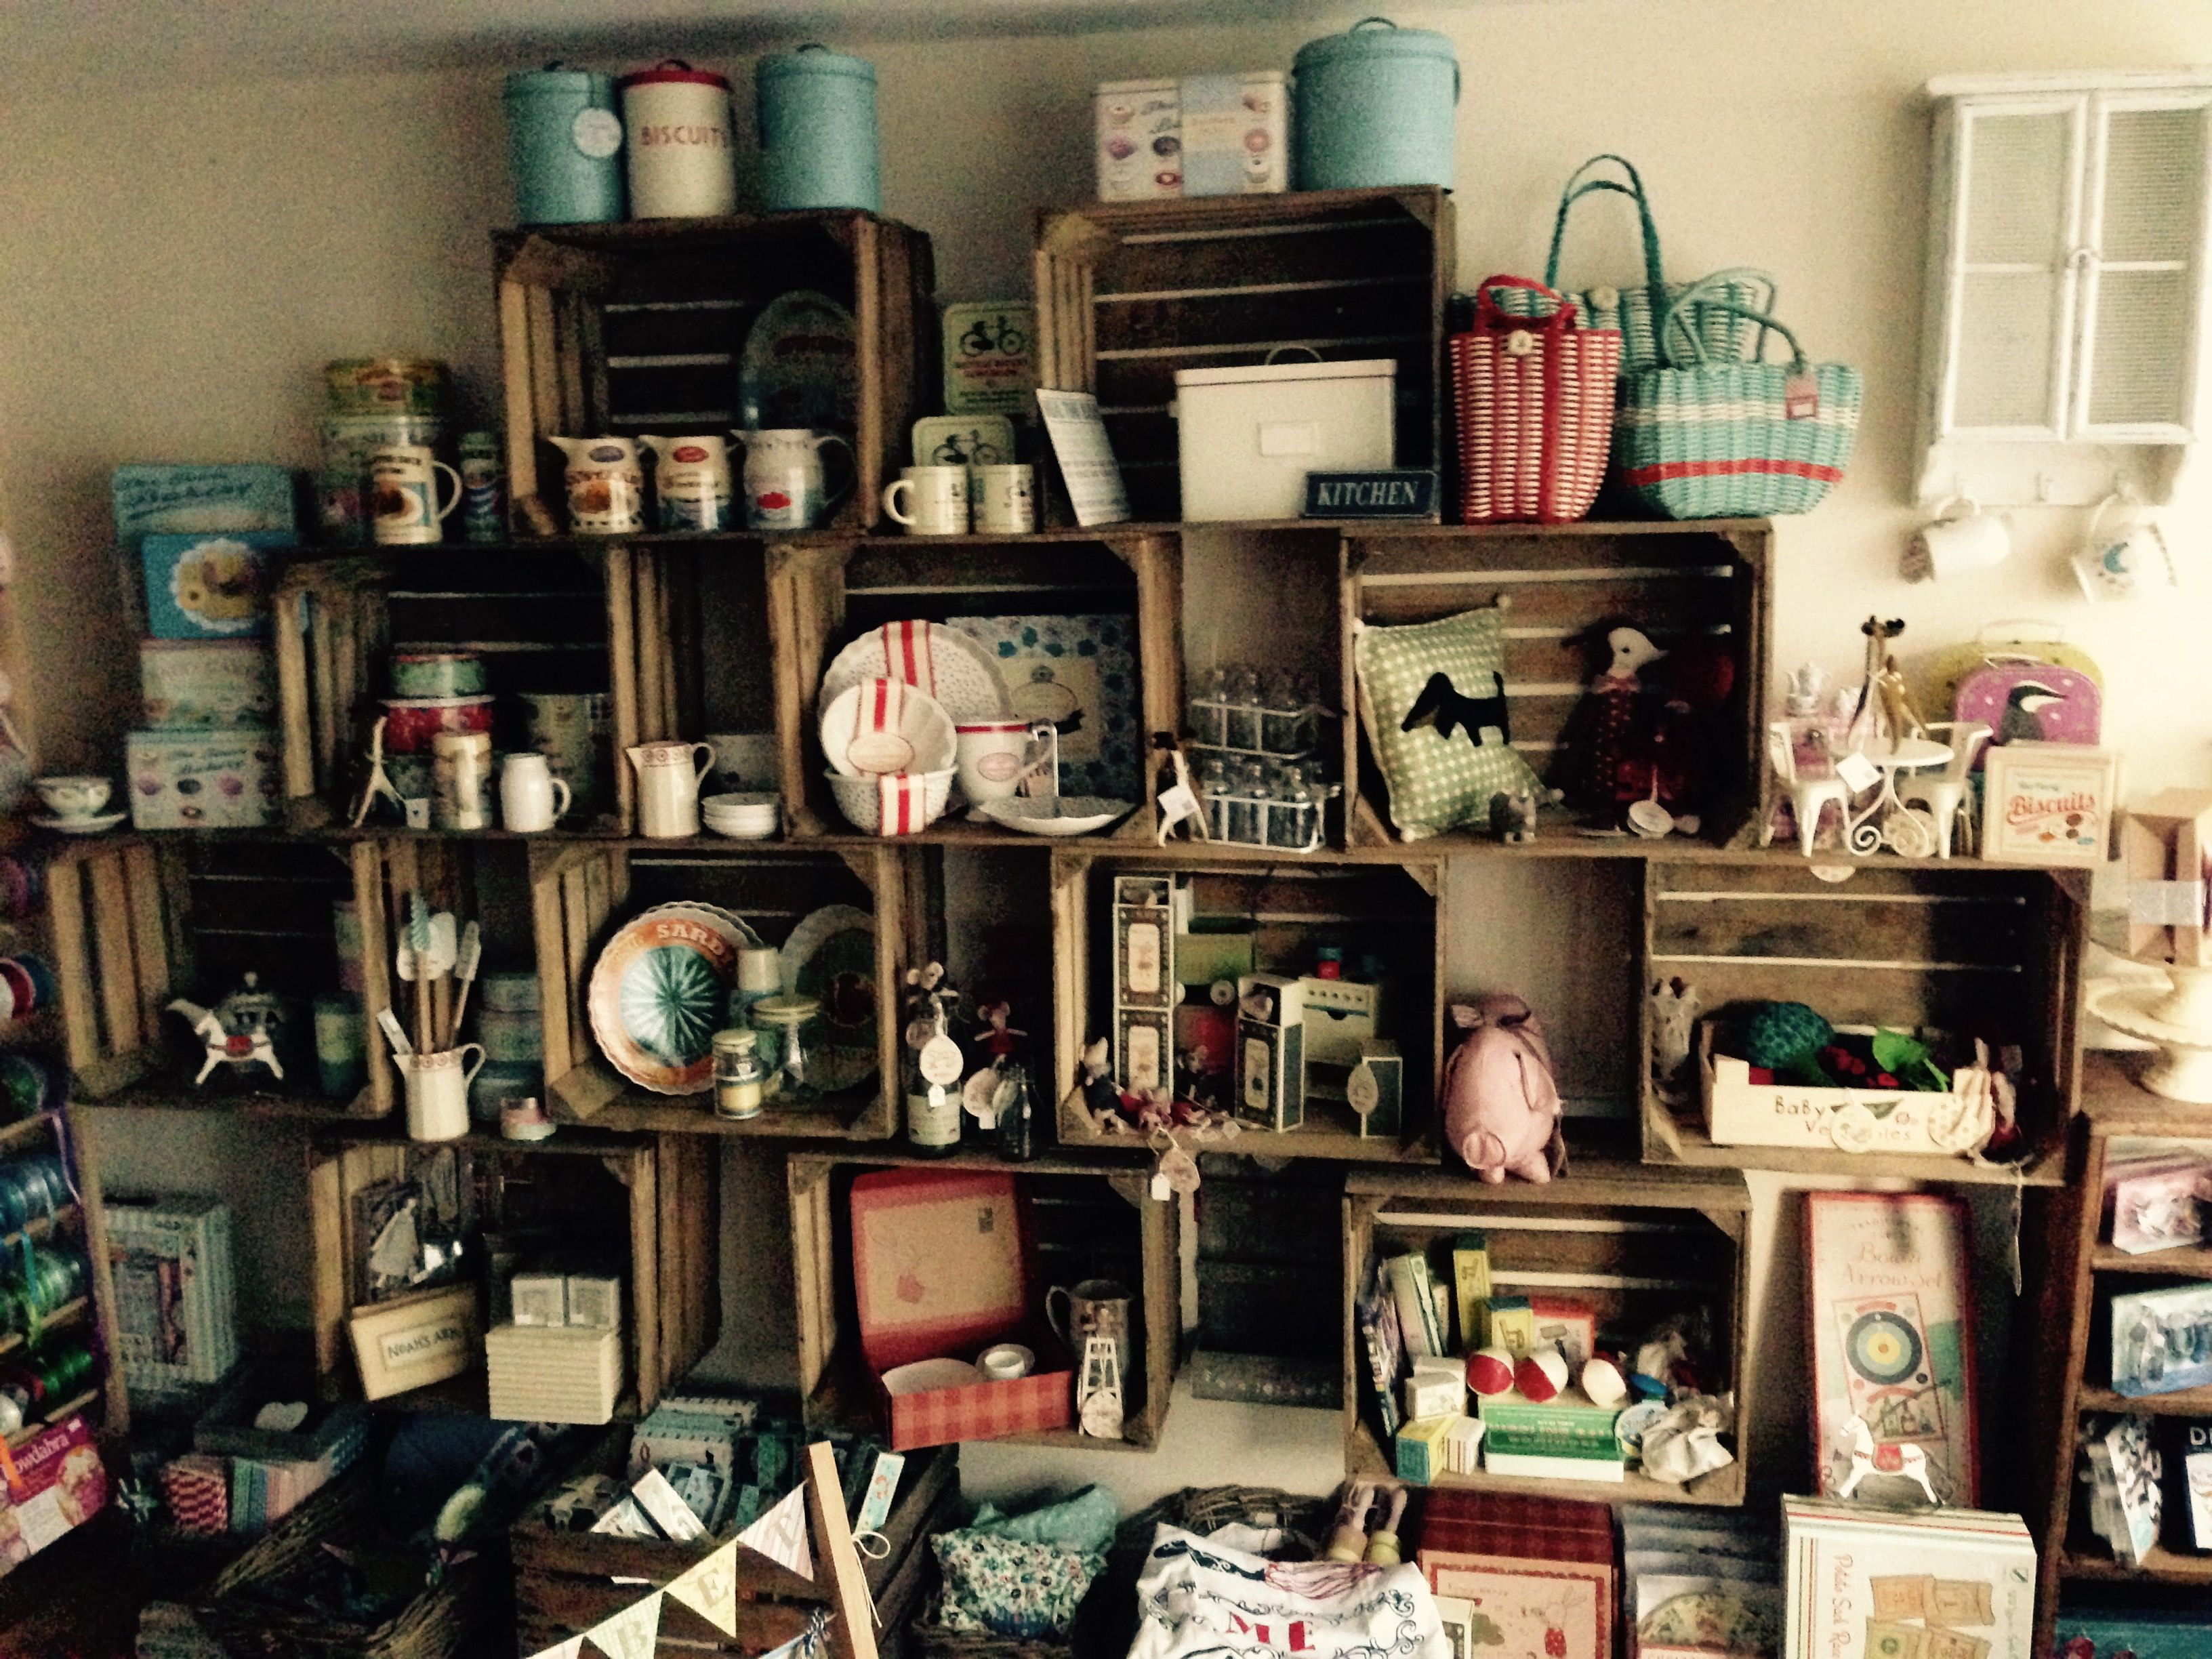 Idea by The Small Cake Shop on Wincanton Shop | Lush ...